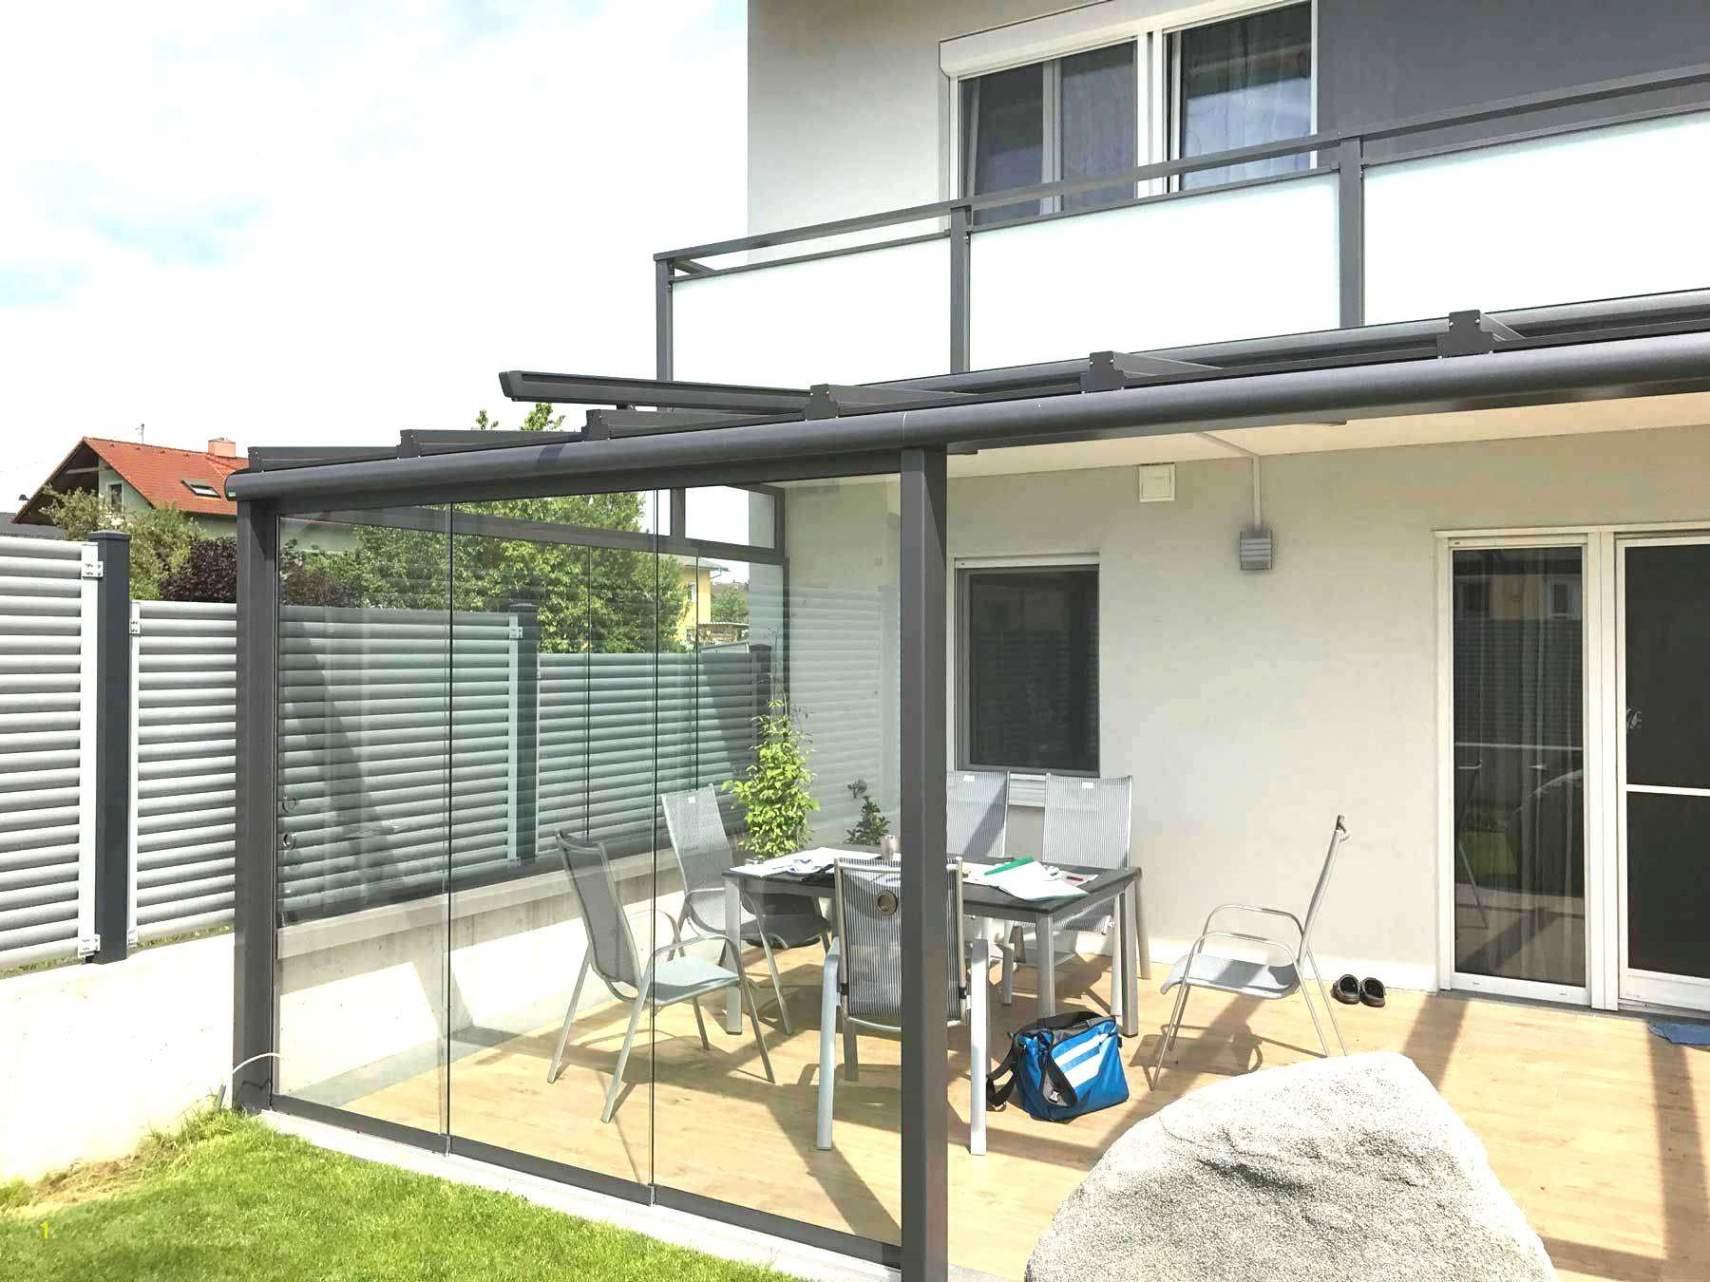 30 Inspirierend Garten Terrasse Selber Bauen Schon Garten Anlegen